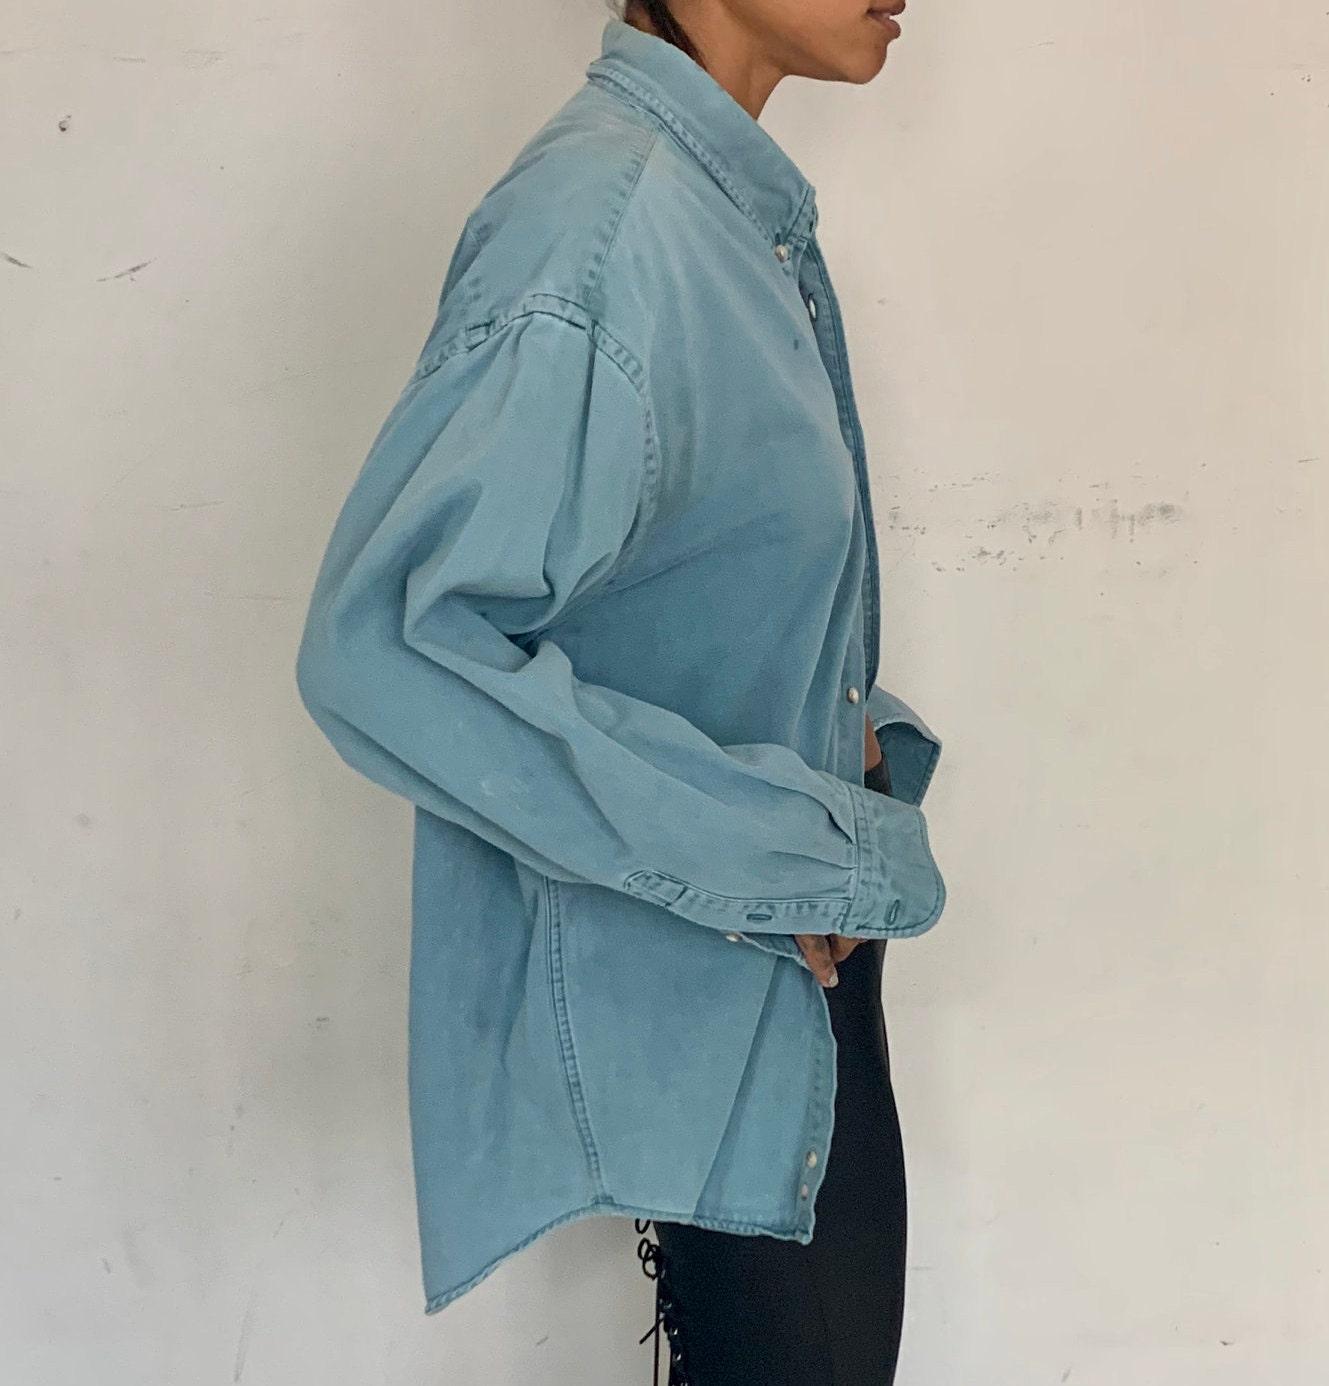 80s Tops, Shirts, T-shirts, Blouse   90s T-shirts Oversized Worn Work Shirt, Blue Denim $98.00 AT vintagedancer.com